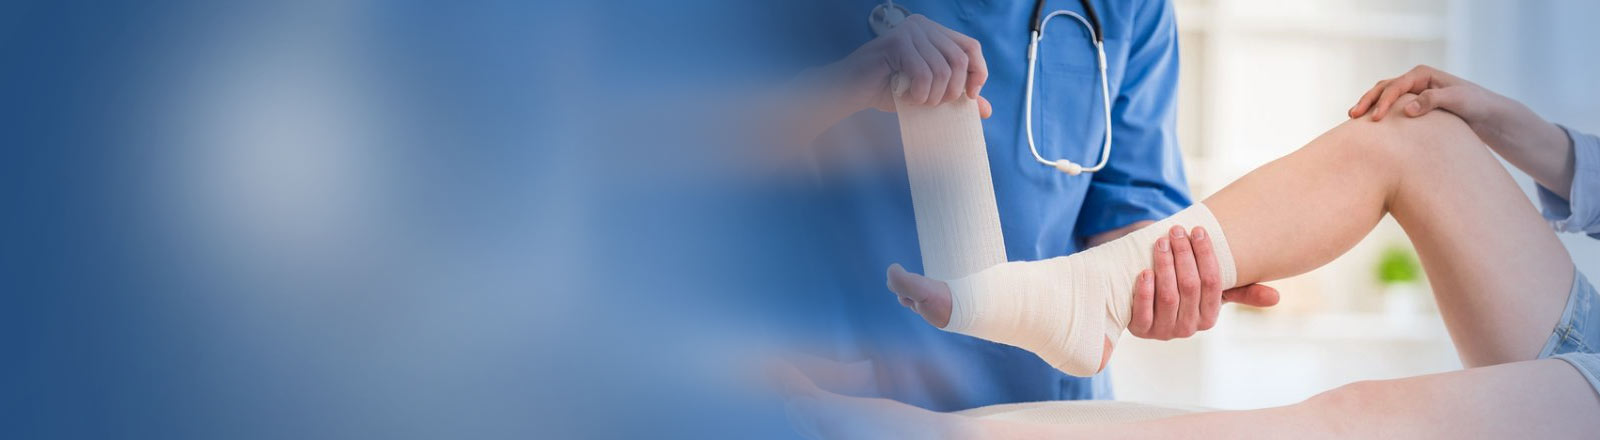 Orthopedic Treatment at Galaxy Care Hospital